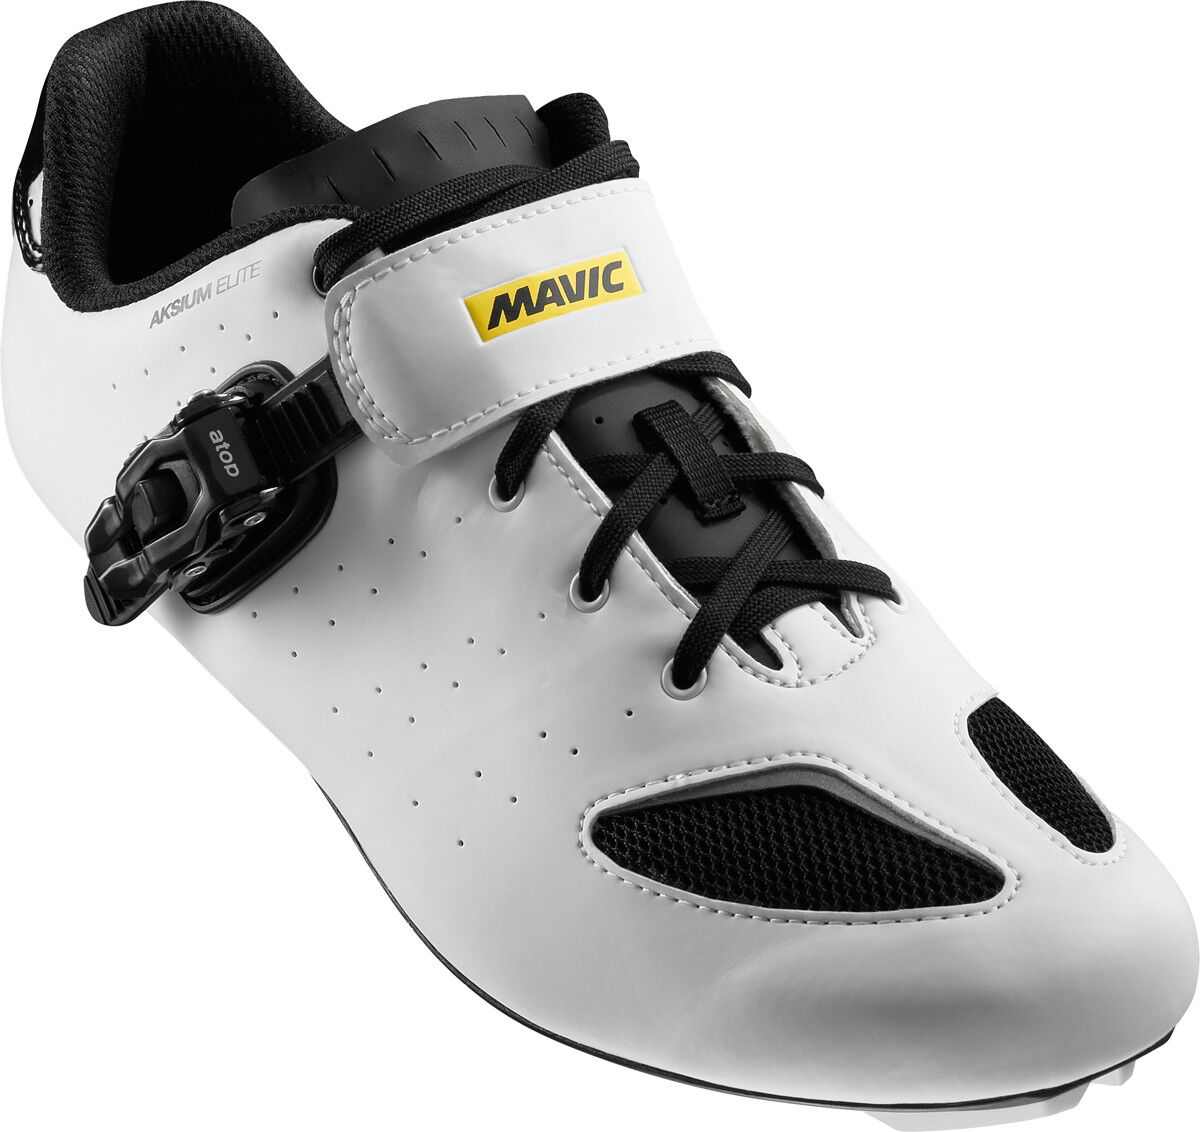 Mavic aksium elite III bicicleta bicicleta zapatos blancooo negro 2018